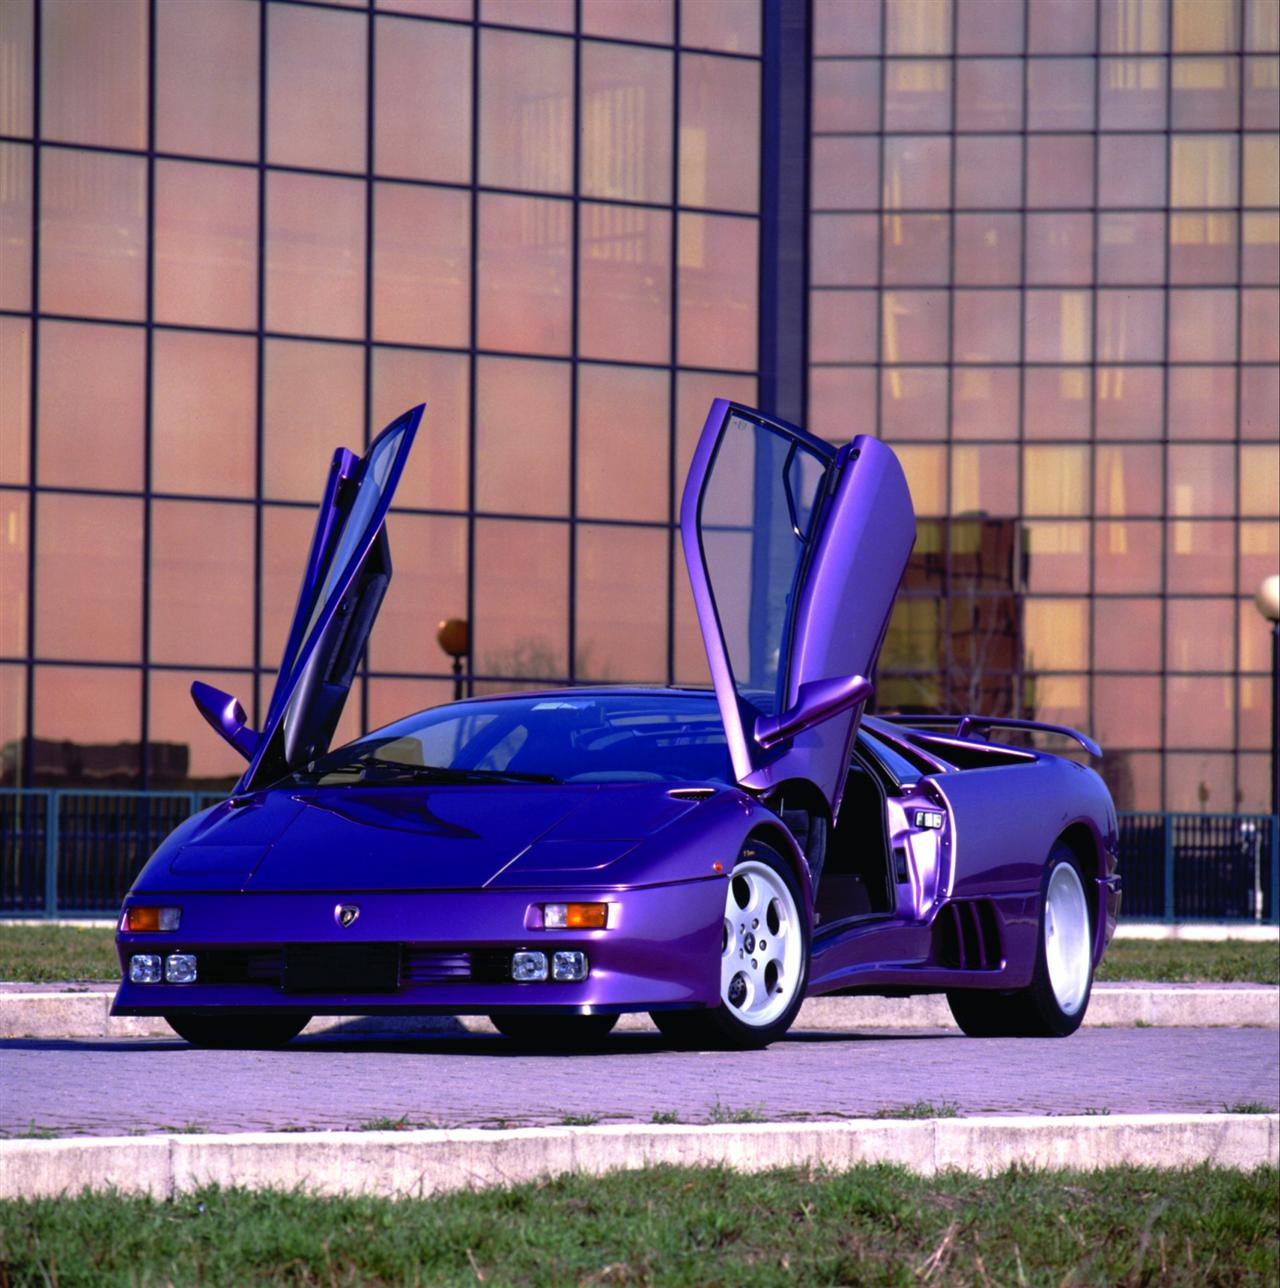 https://www.conceptcarz.com/images/Lamborghini/1994-Lamborghini-Diablo-SE_Image-05-1280.jpg